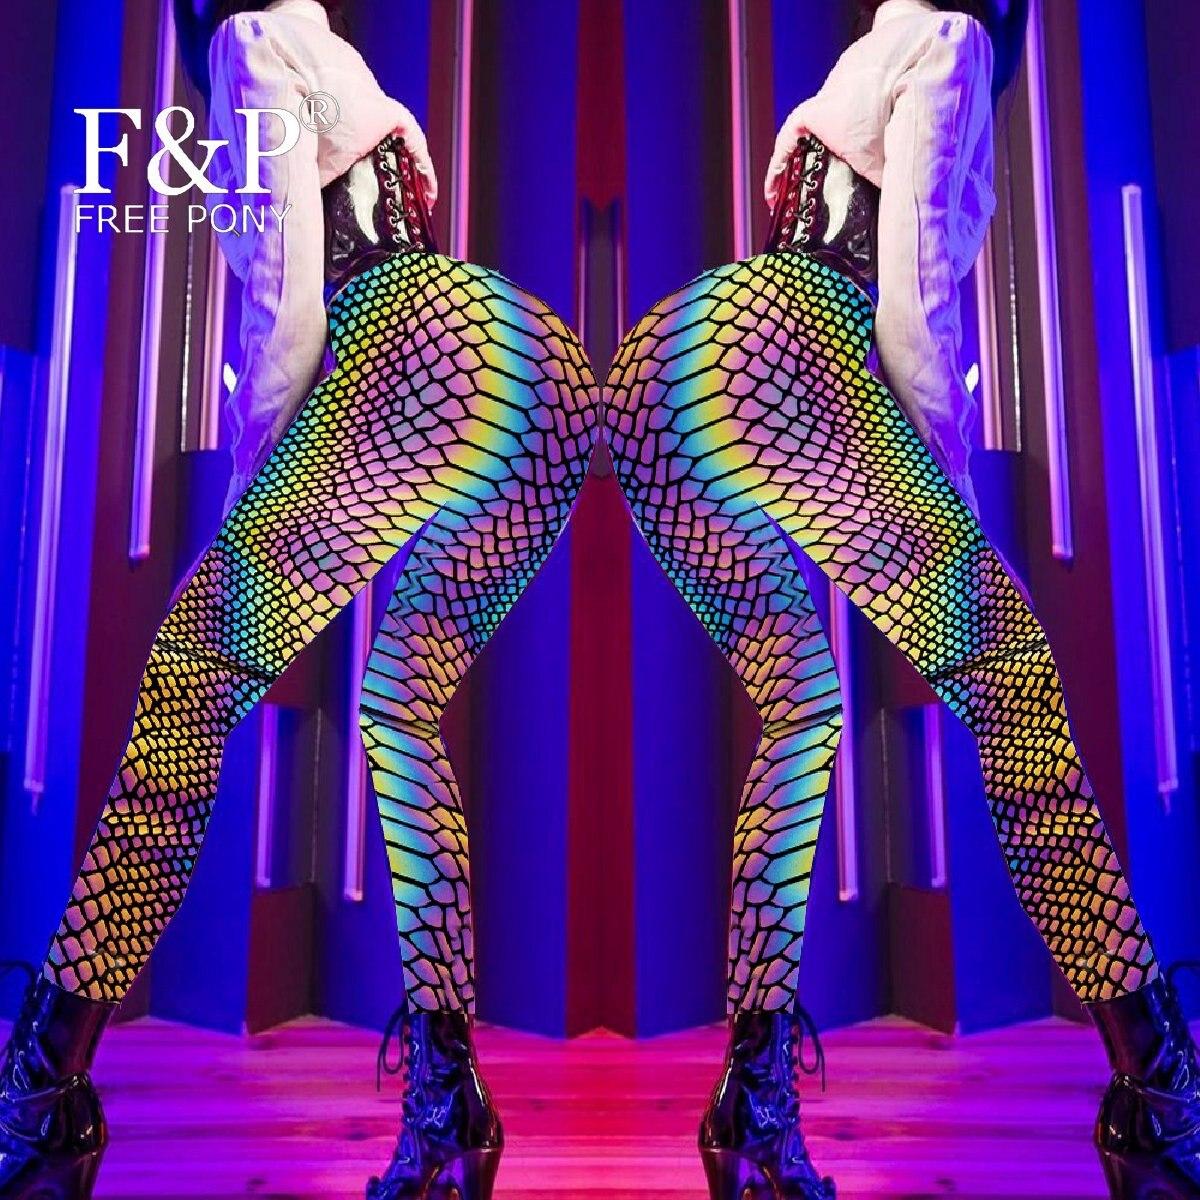 Handmade Plus Size Women Rainbow Reflective Snake Skin High Waisted Leggings Yoga Butt Lifting Pants Rave Festival Clothes